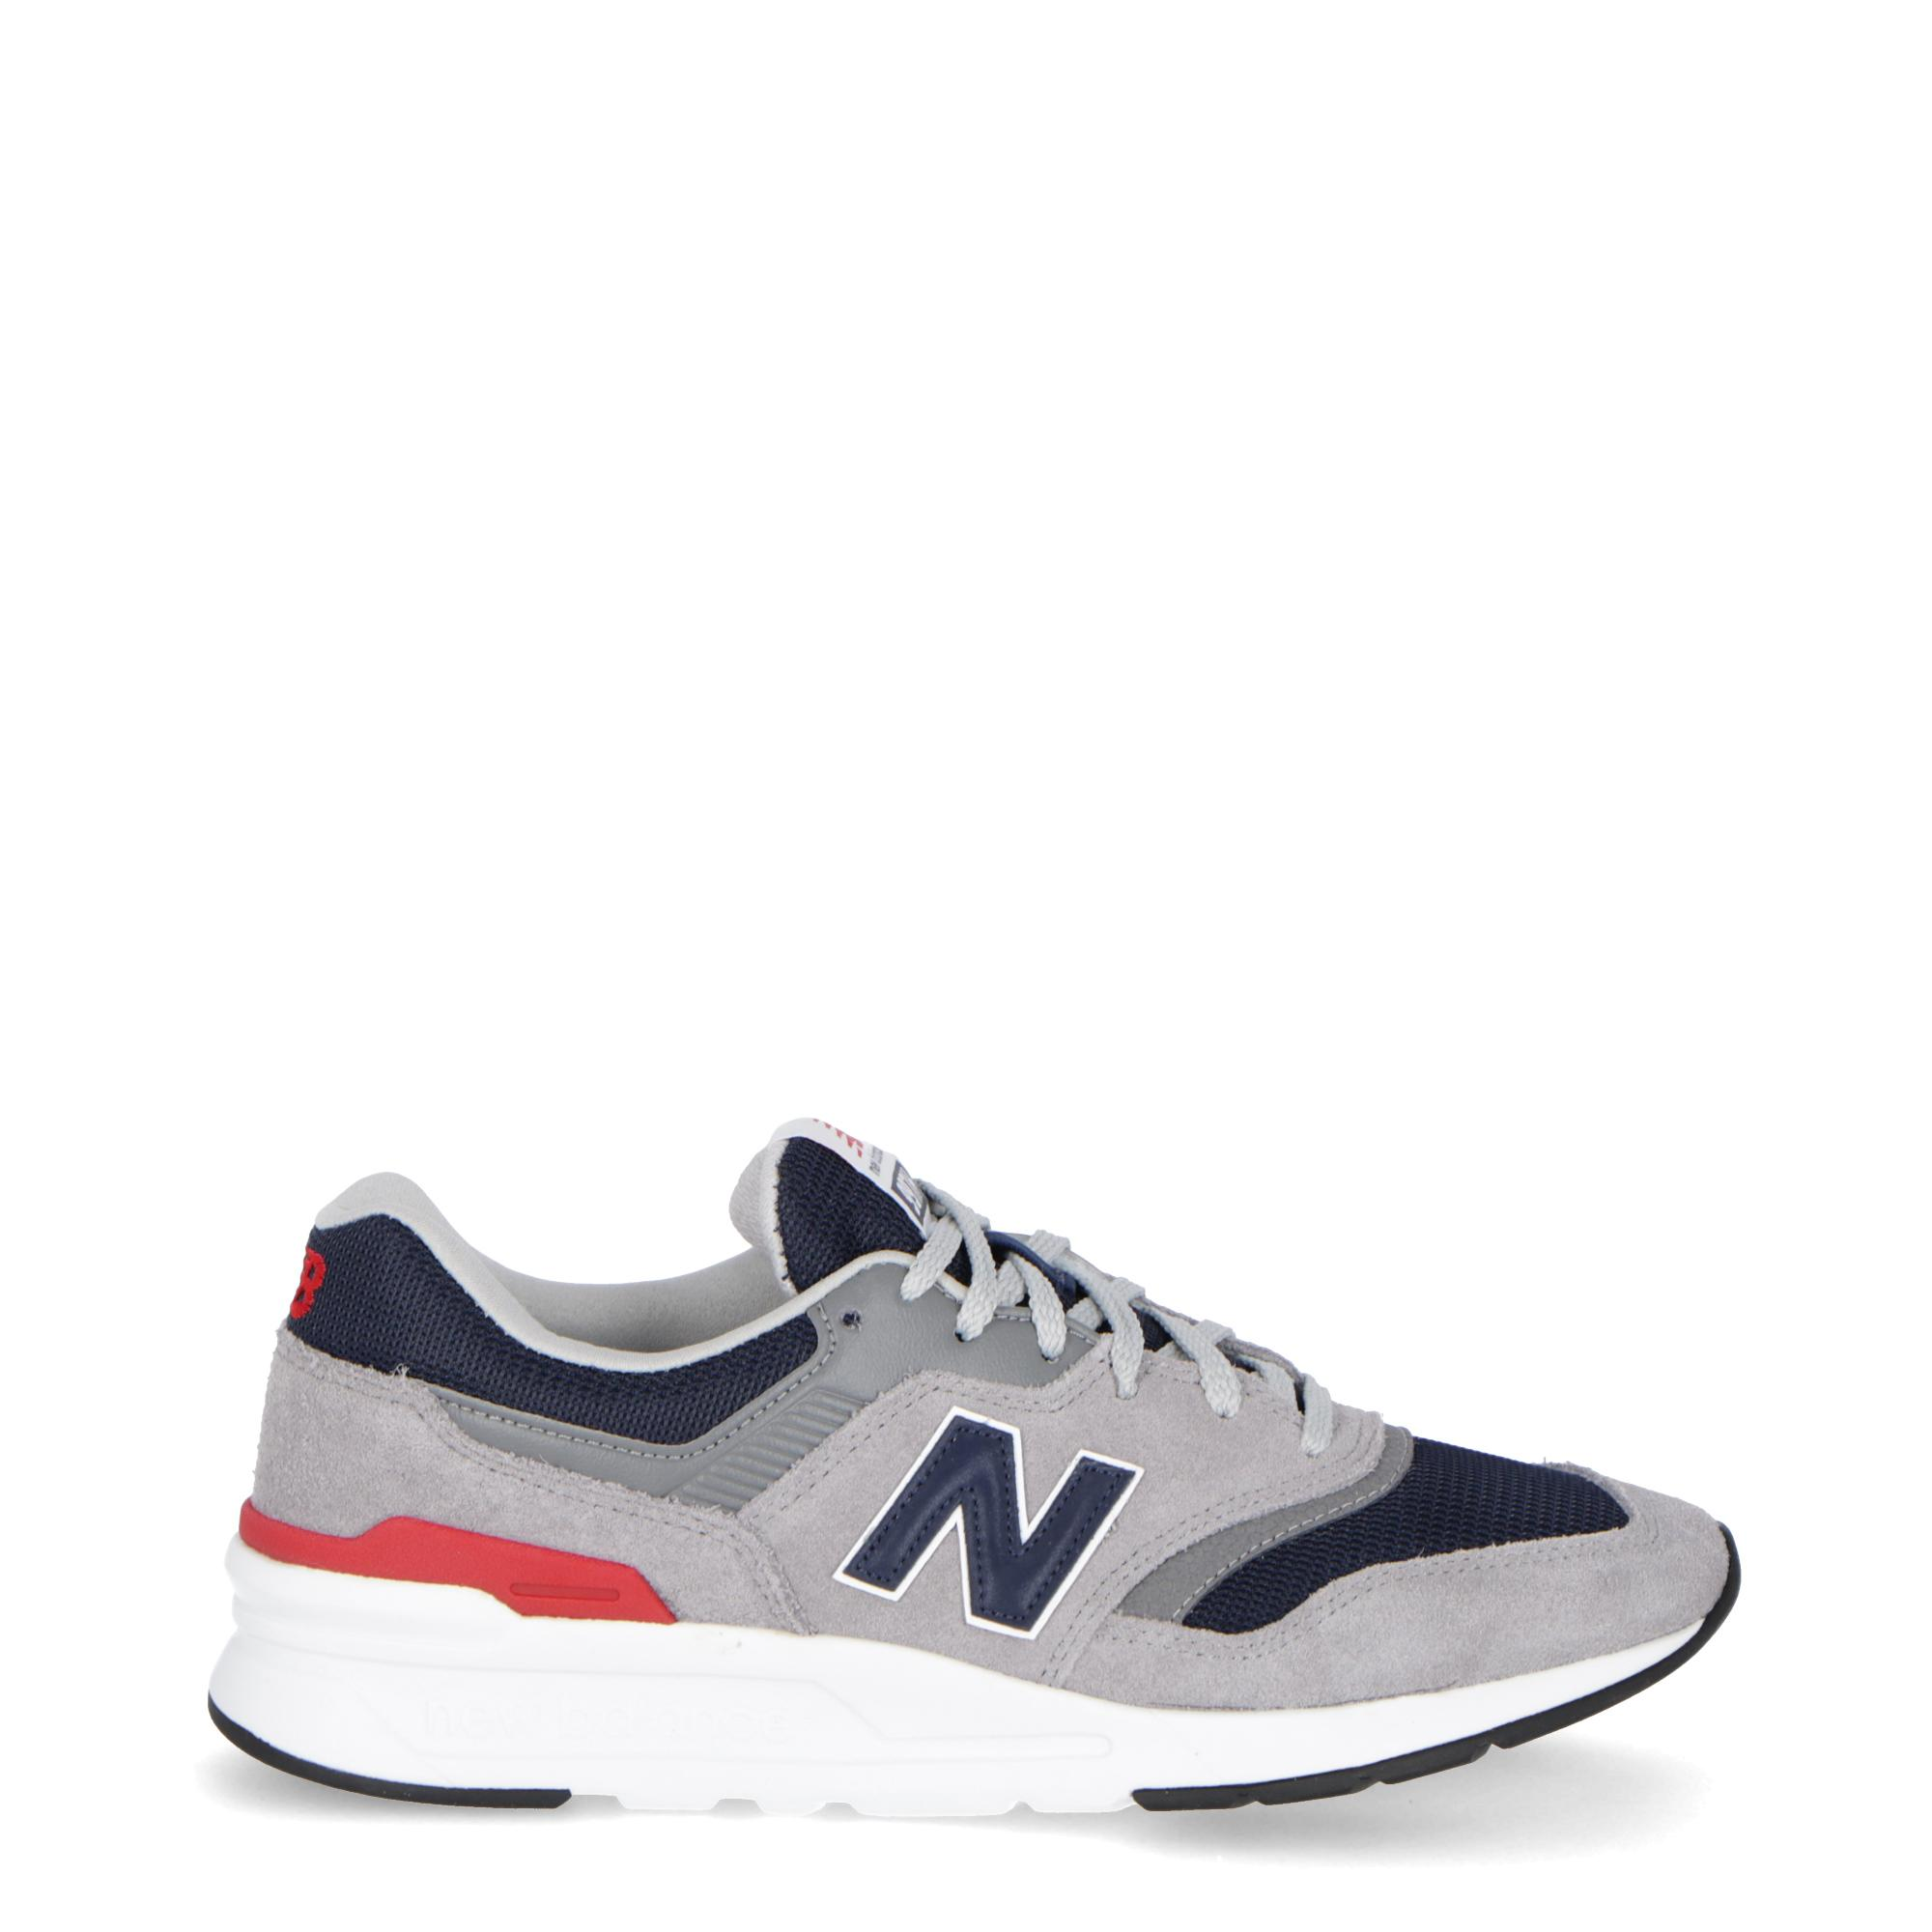 88bd20b1e2246 New Balance 997 Grey/navy/red | Treesse